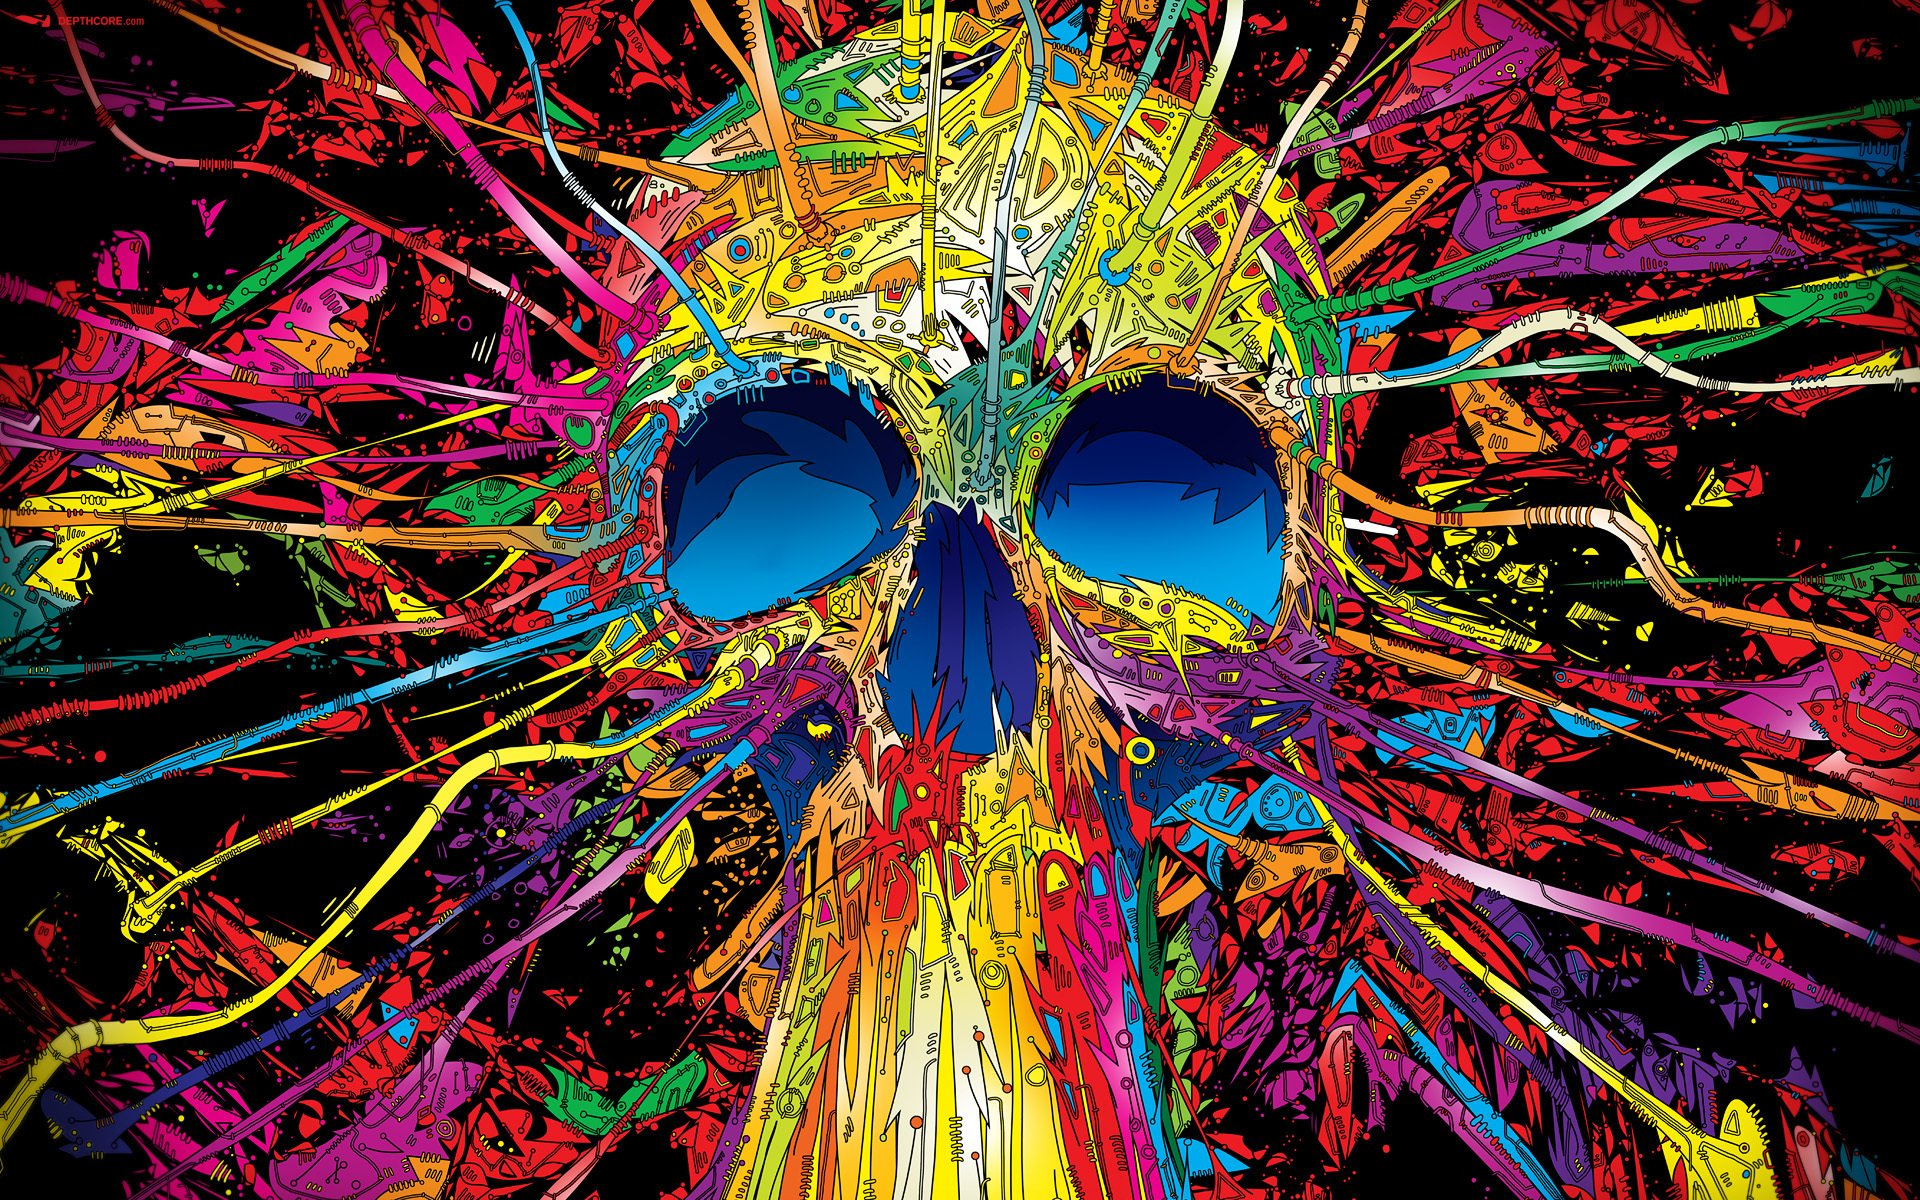 skull hd backgrounds wallpaper psychedelic skull hd backgrounds hd 1920x1200